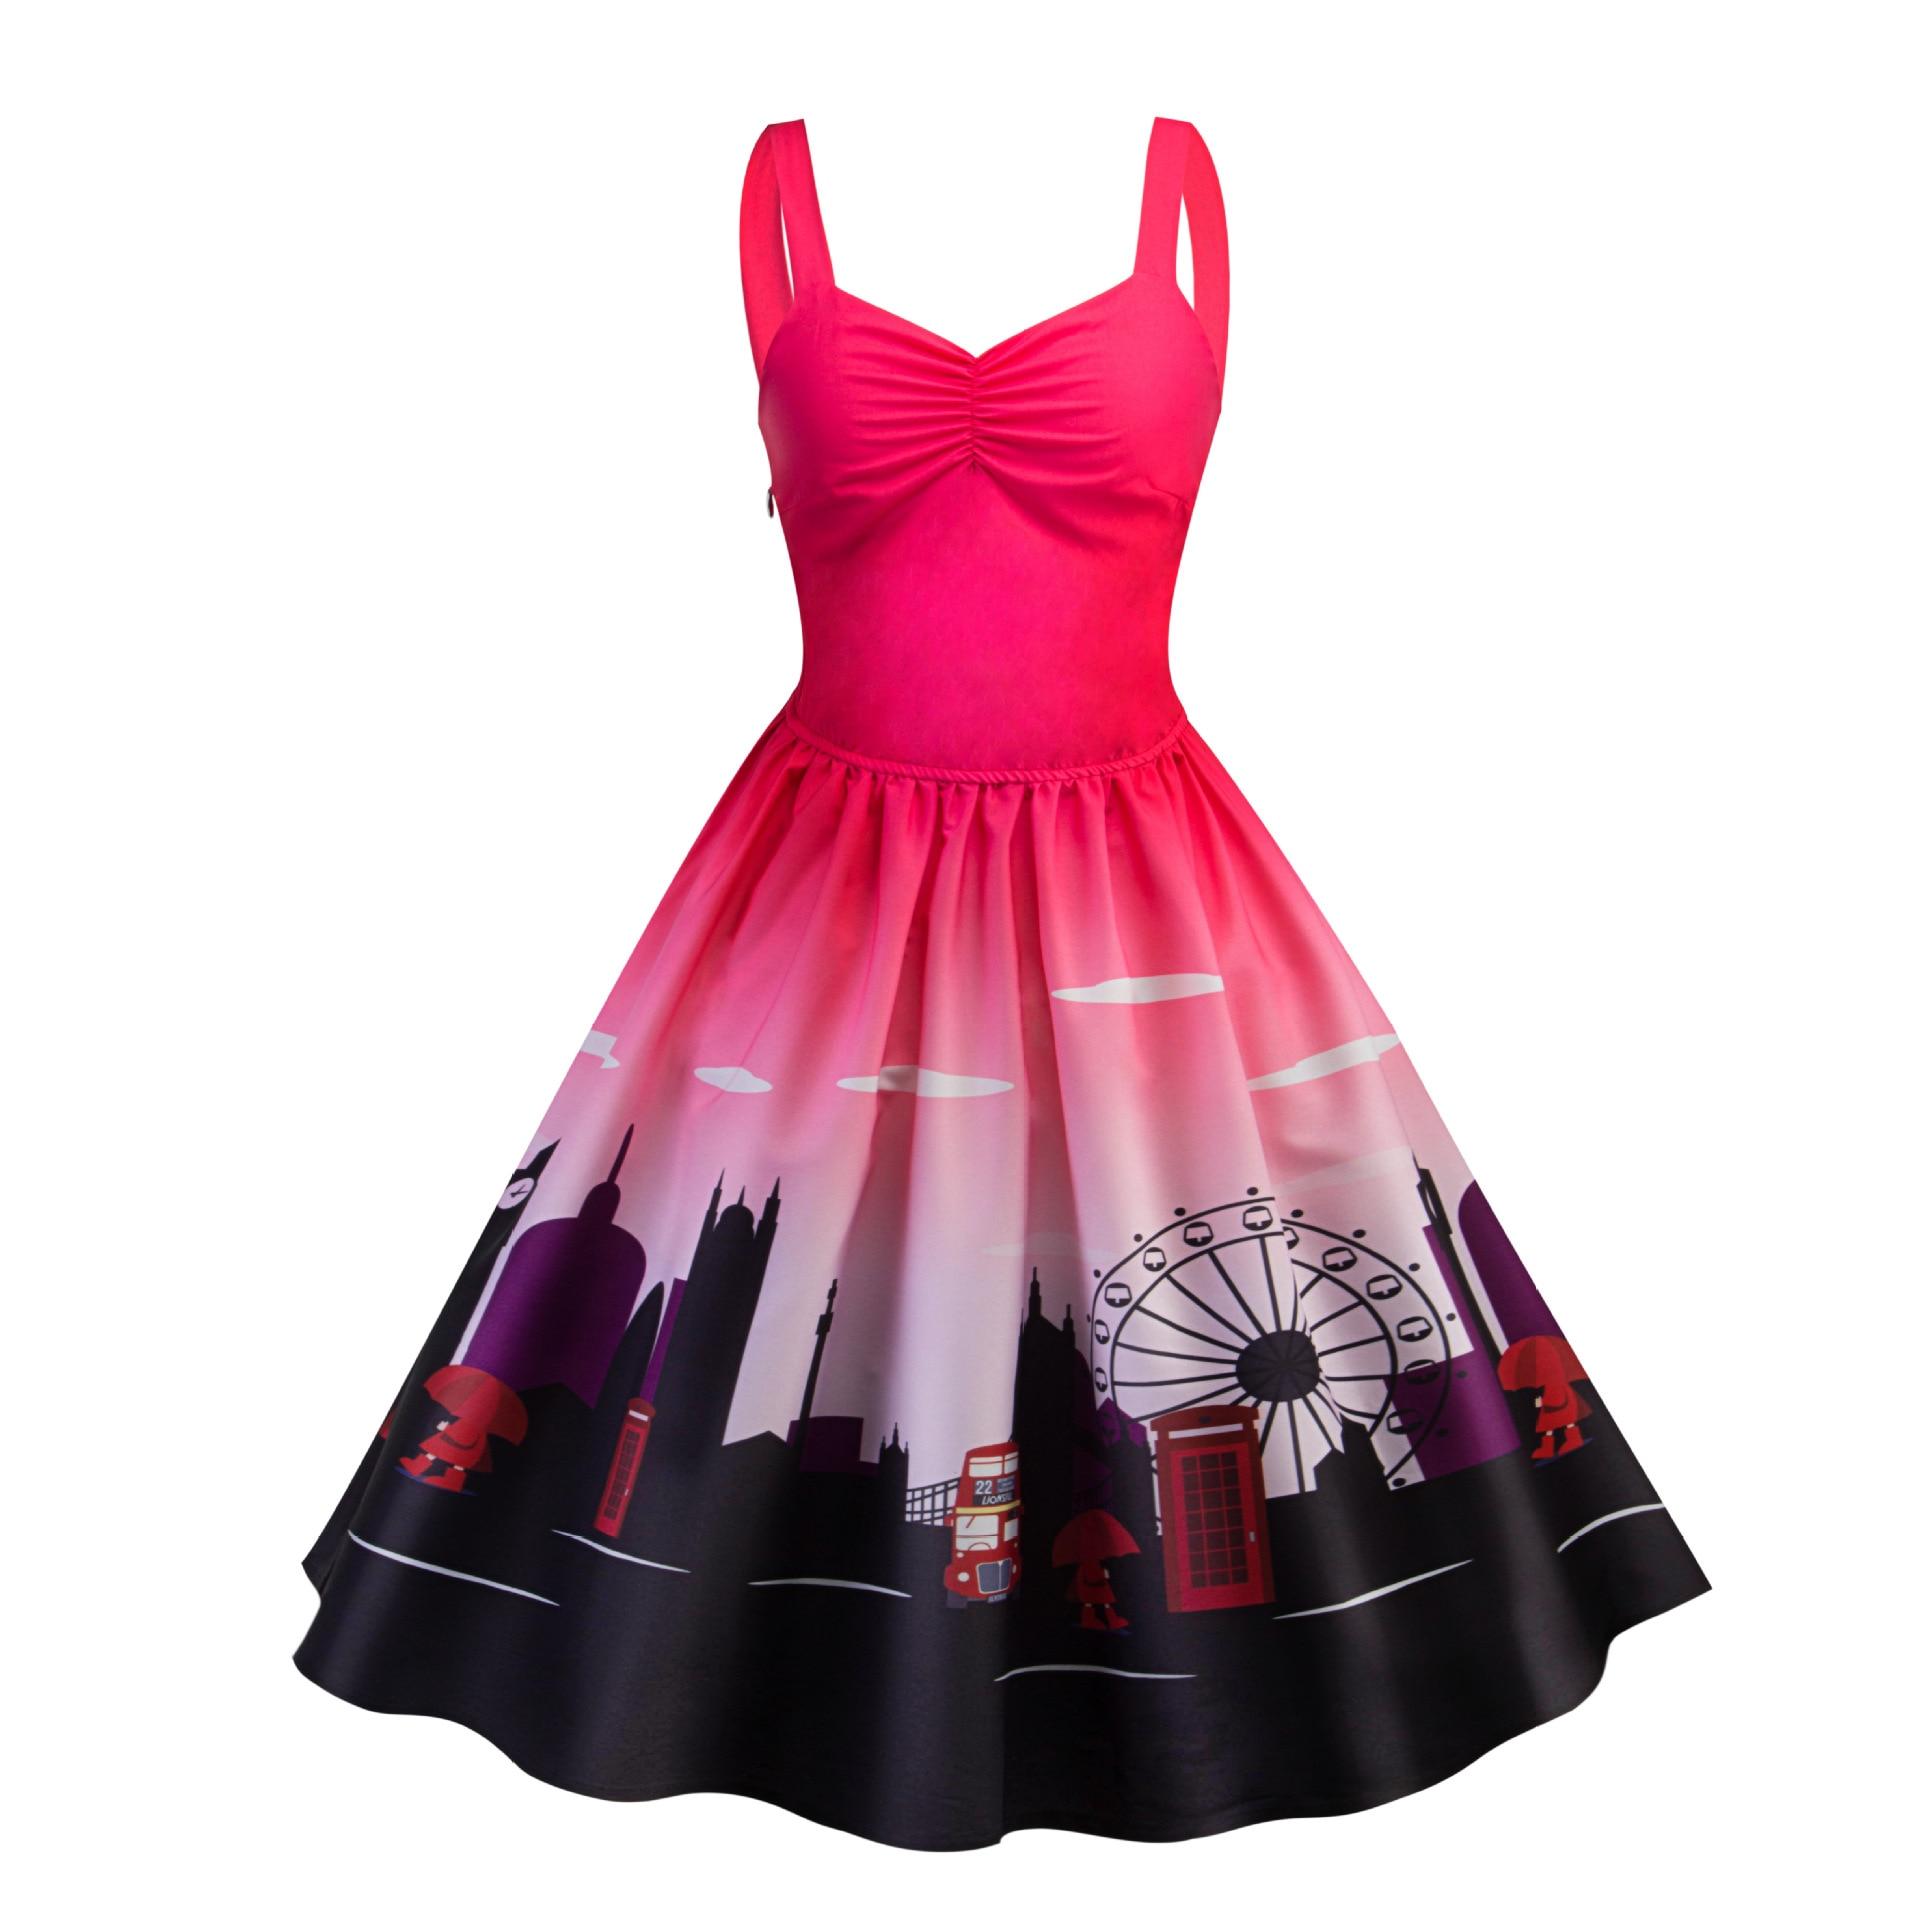 83dd86233 Retro Vintage 1950s 60s Rockabilly Dress 2018 Strapless Audrey Hepburn  Style Big Swing Sexy Print Summer Dresses